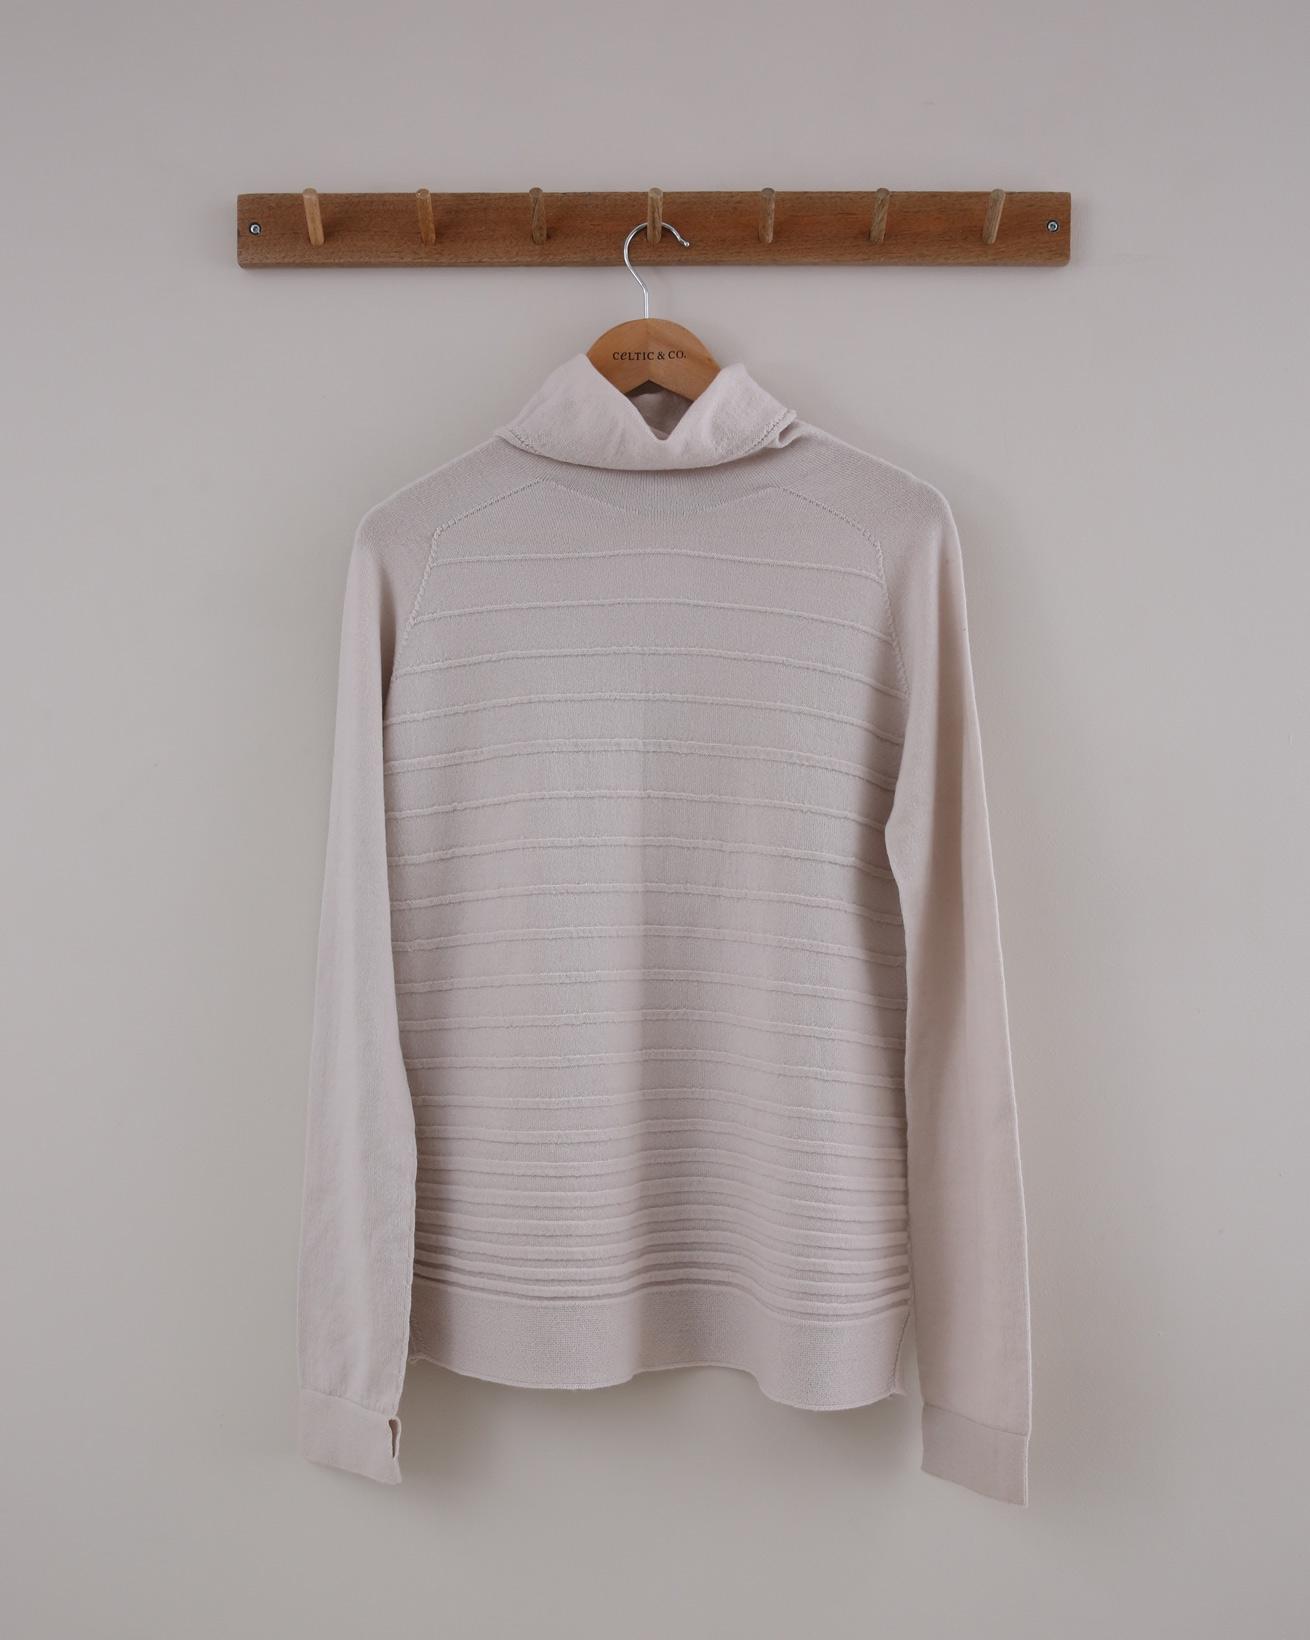 Textured Stitch Merino Roll Neck - Small - Swansdown - 1412